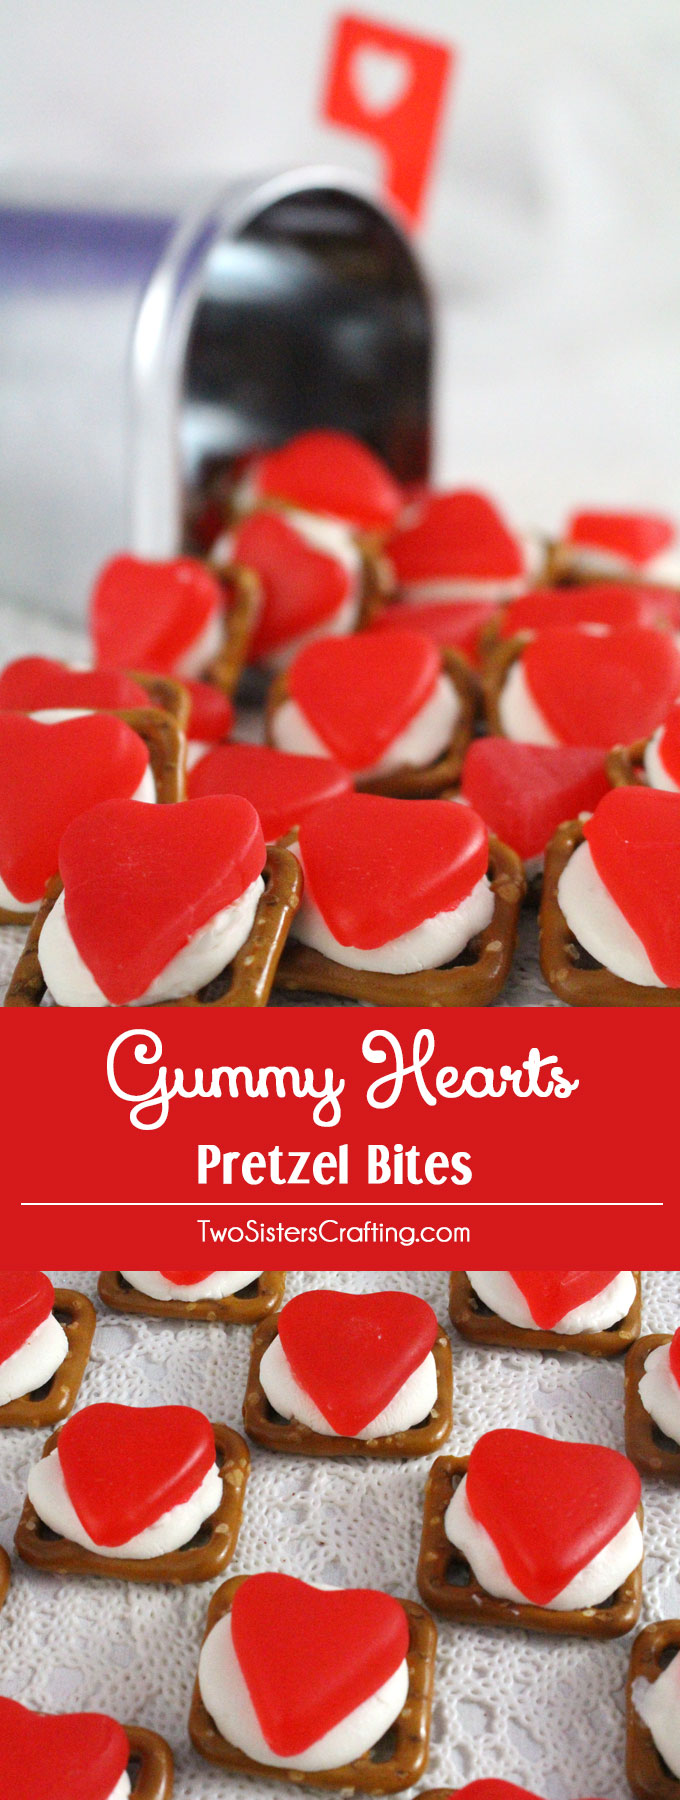 Gummy Hearts Pretzel Bites Two Sisters